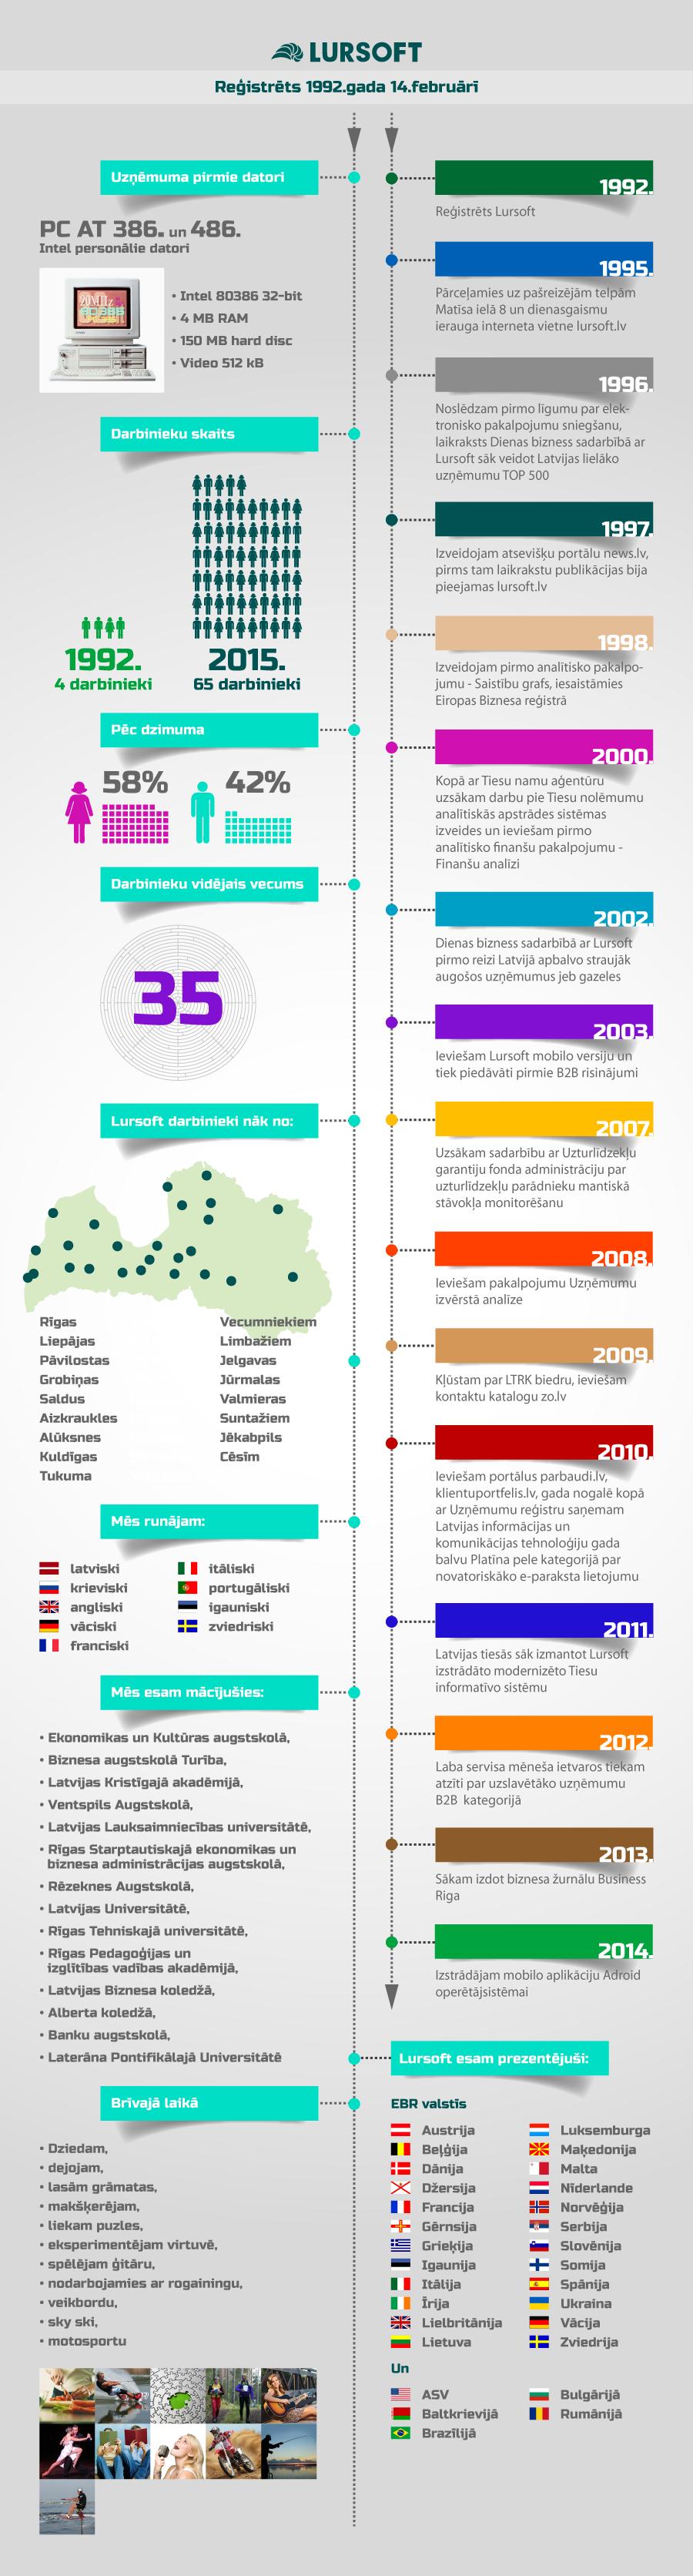 Lursoft infografika